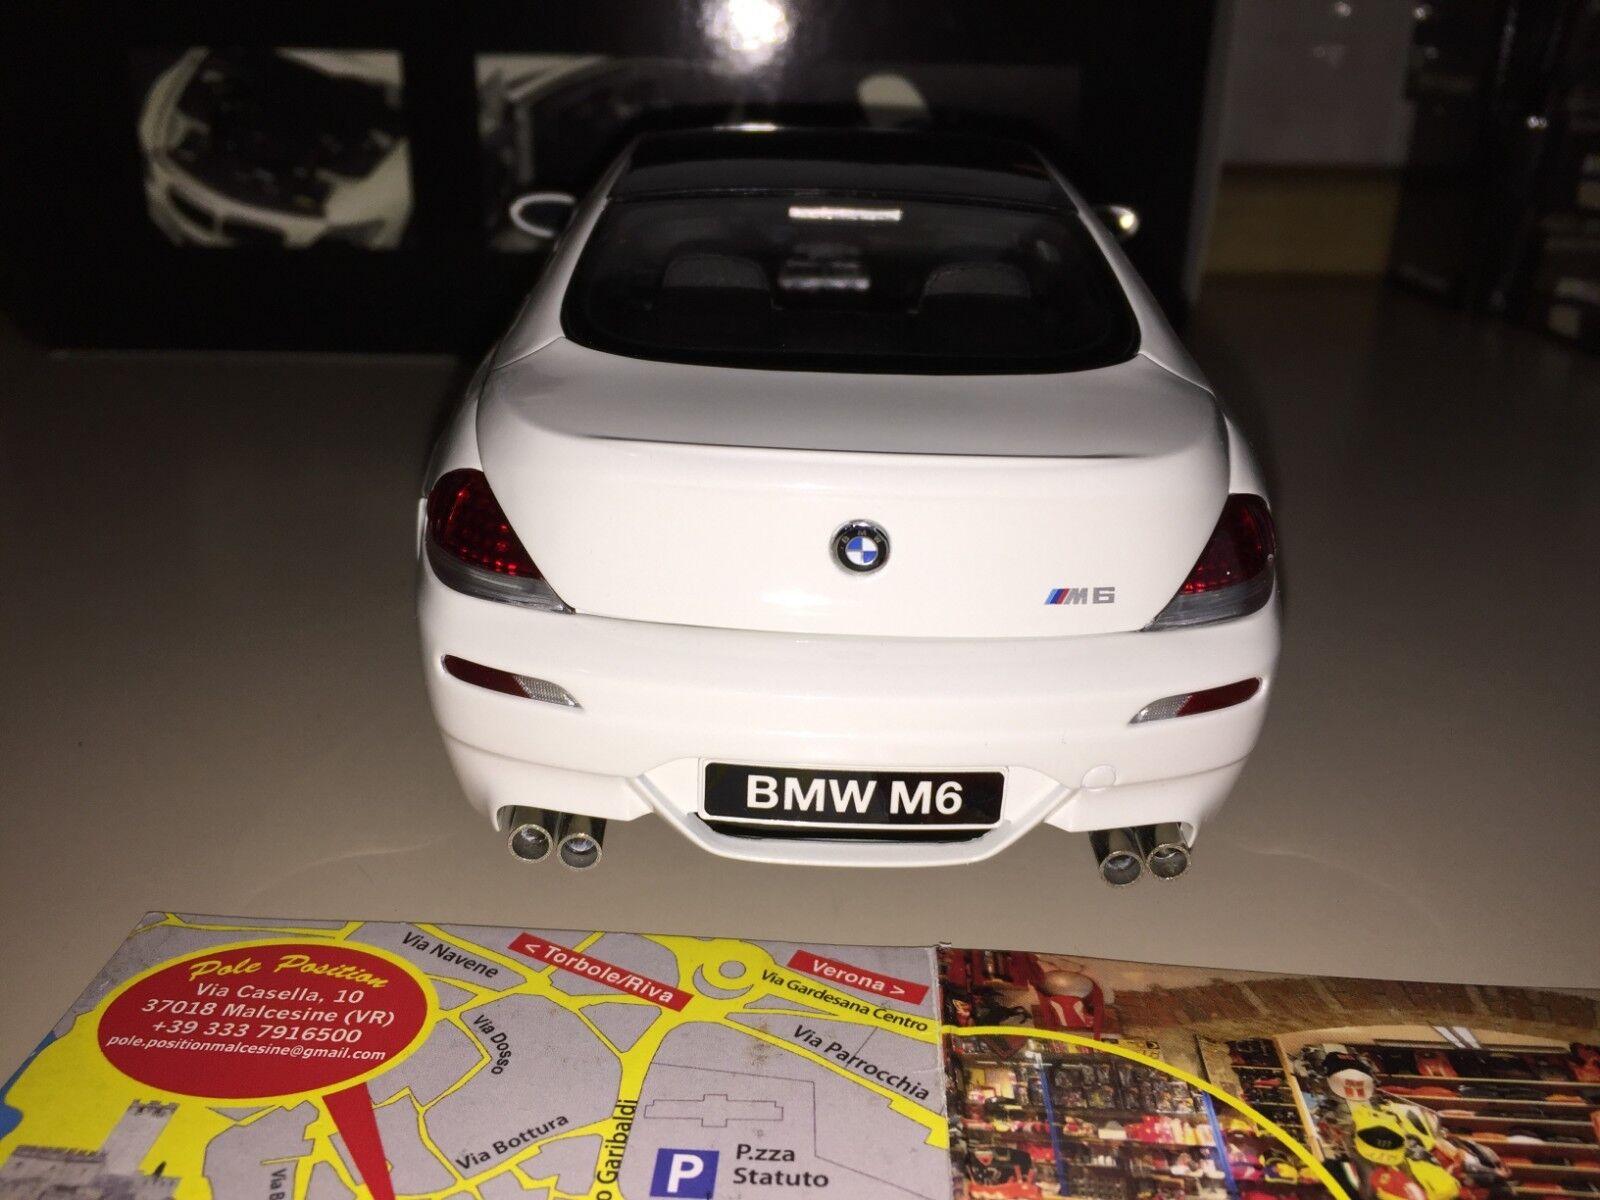 KYOSHO 1 18 BMW M6 COUPE VITT NY RARE FRI SPRIDNING världWIDE